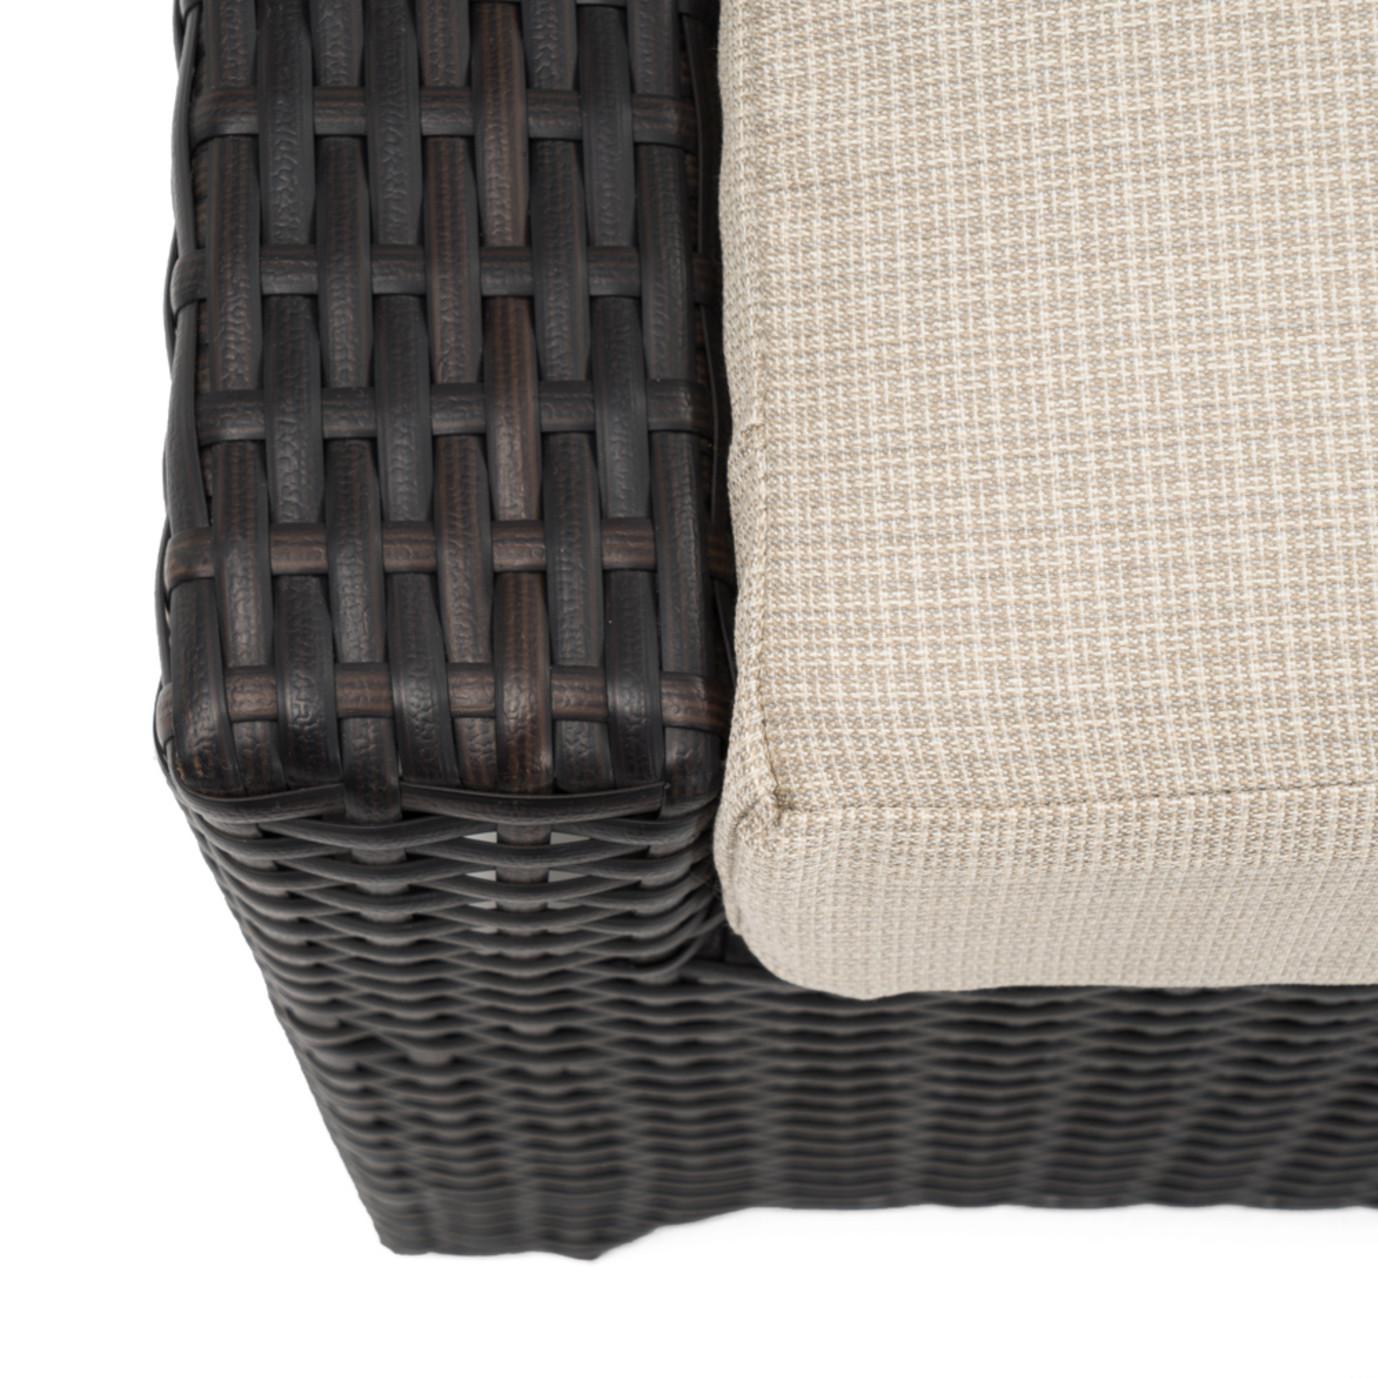 Deco™ Loveseat and Ottoman - Slate Gray